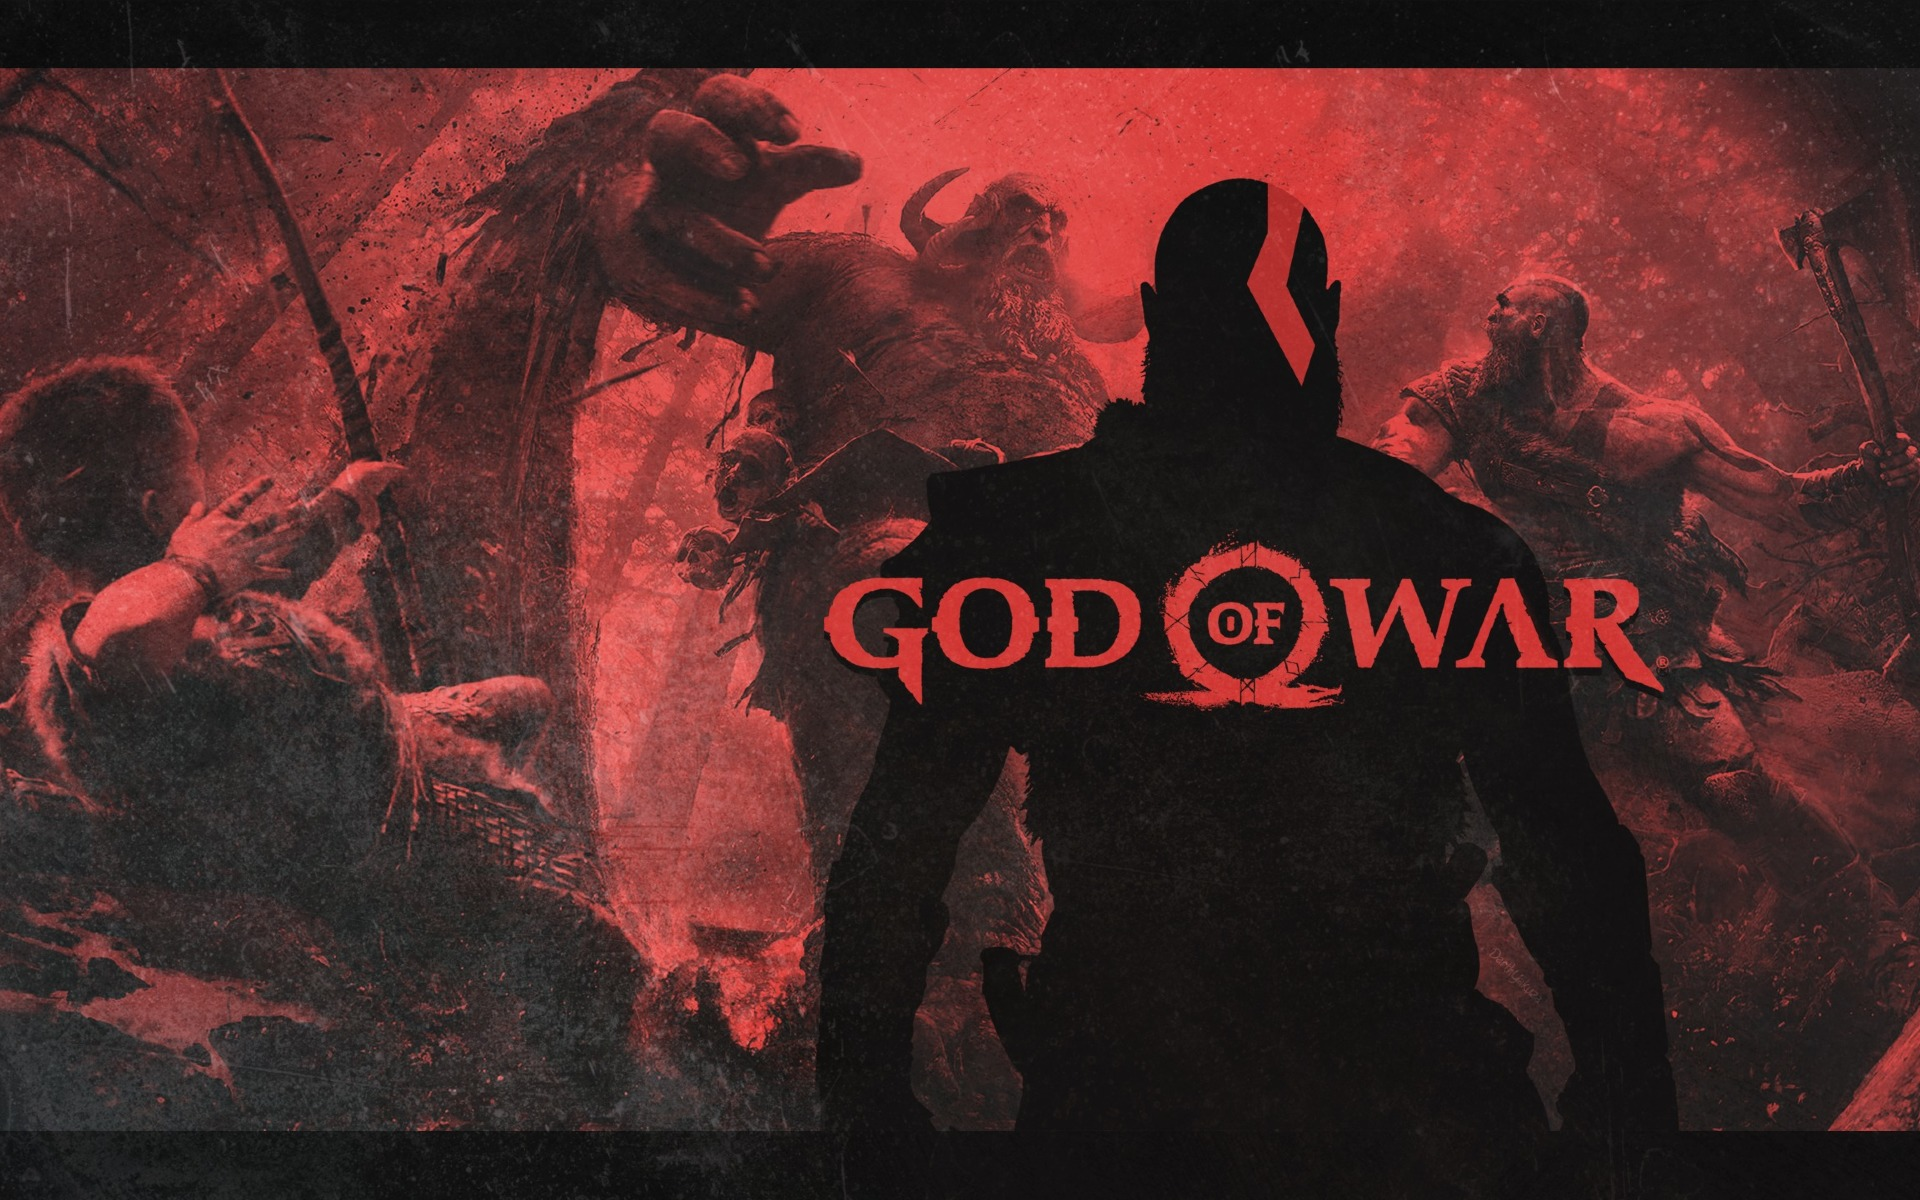 4k Girls Redmi Note 5 Mobile Wallpaper: God Of War 4 Video Game Poster, HD 4K Wallpaper